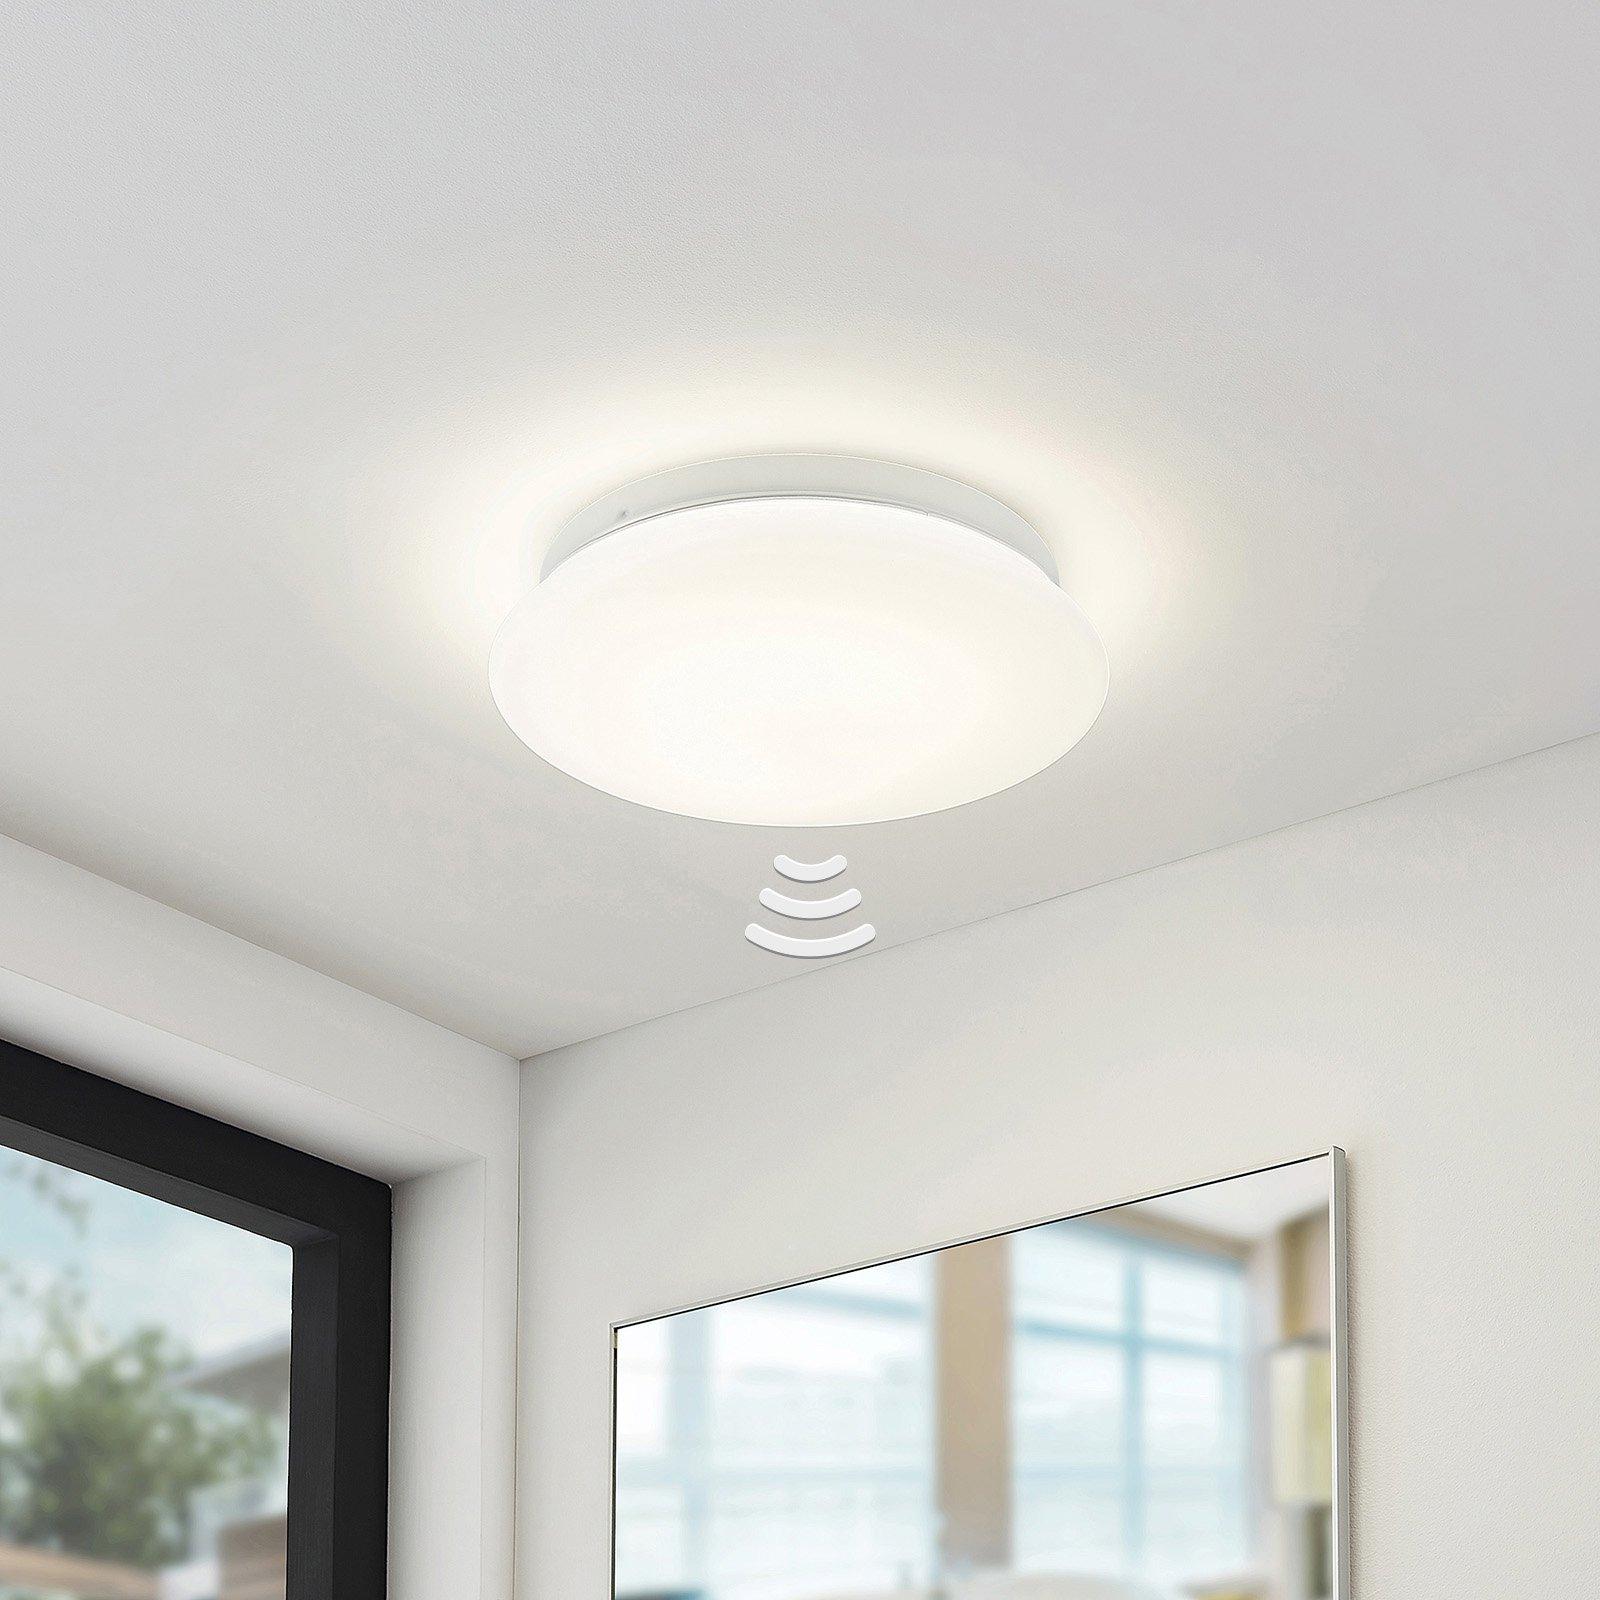 Arcchio Solomia LED-taklampe, sensor, 4 000 K